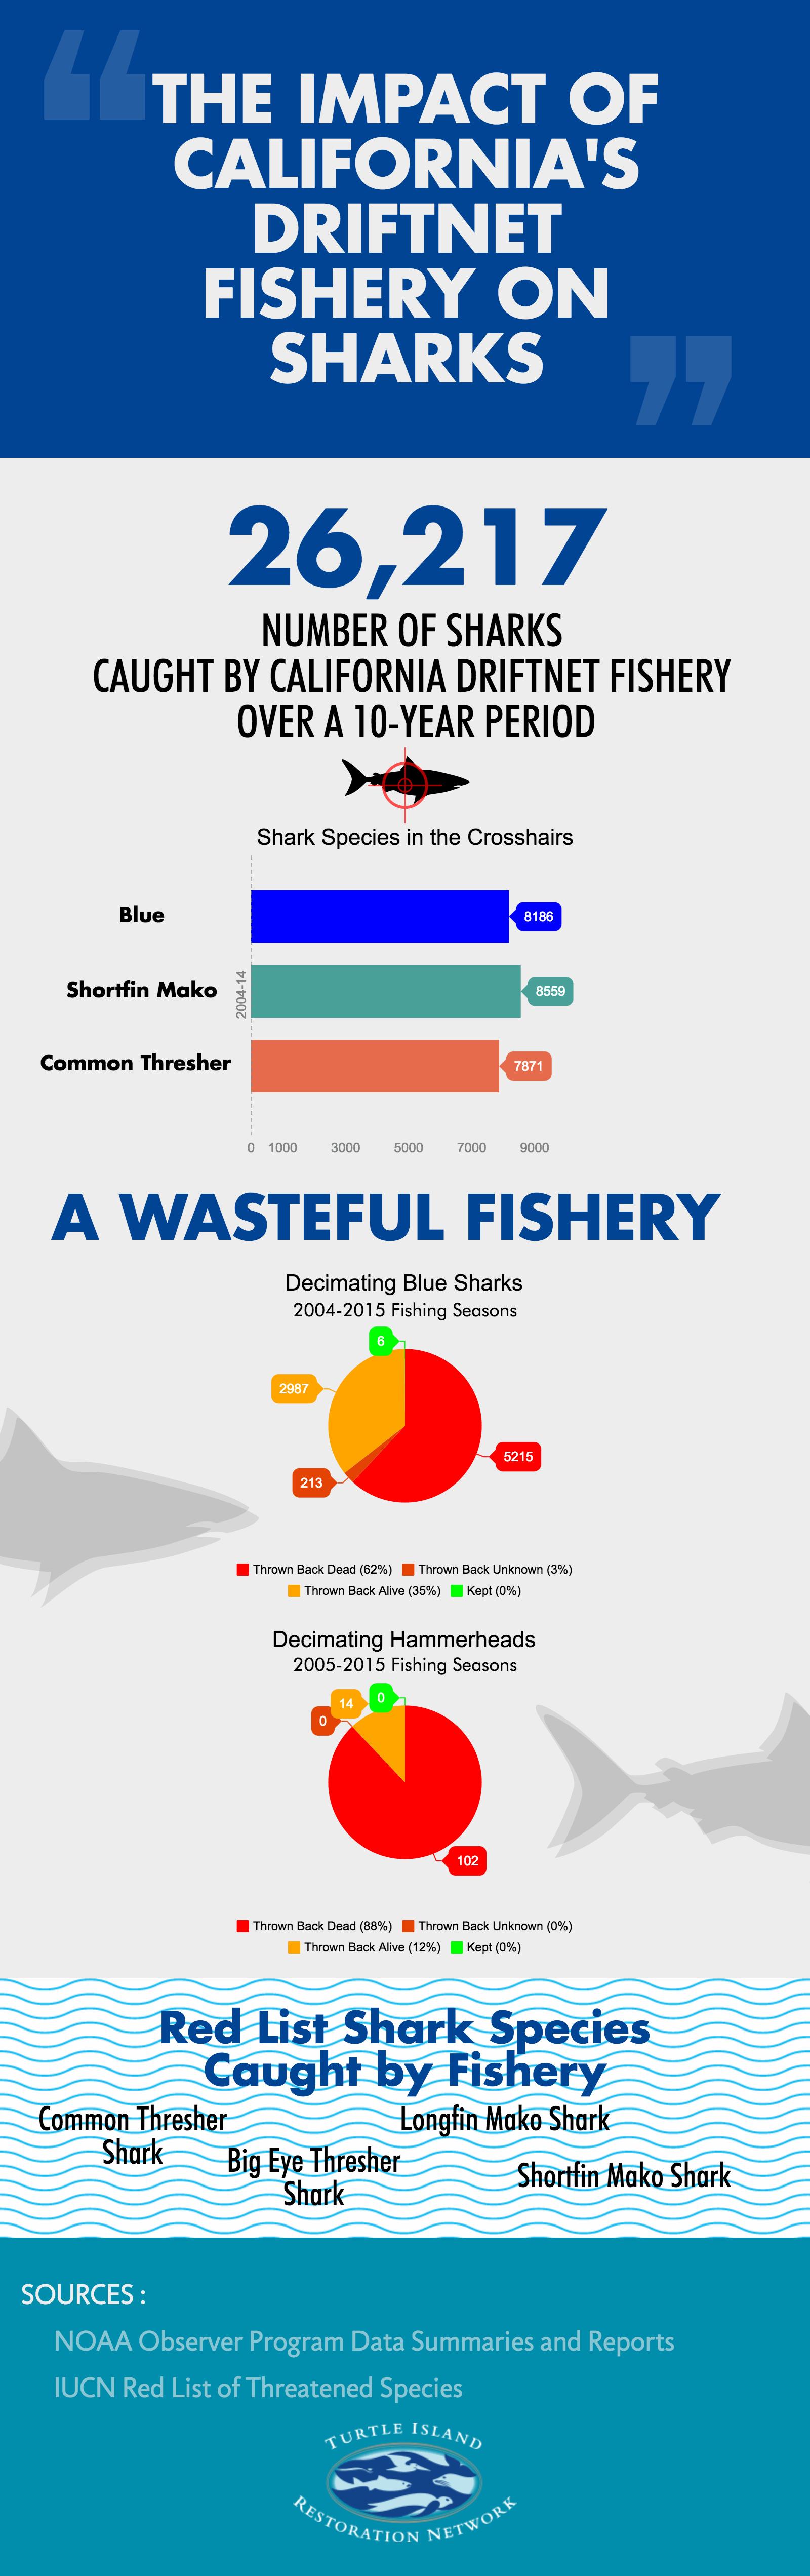 impact-of-driftnets-on-sharks